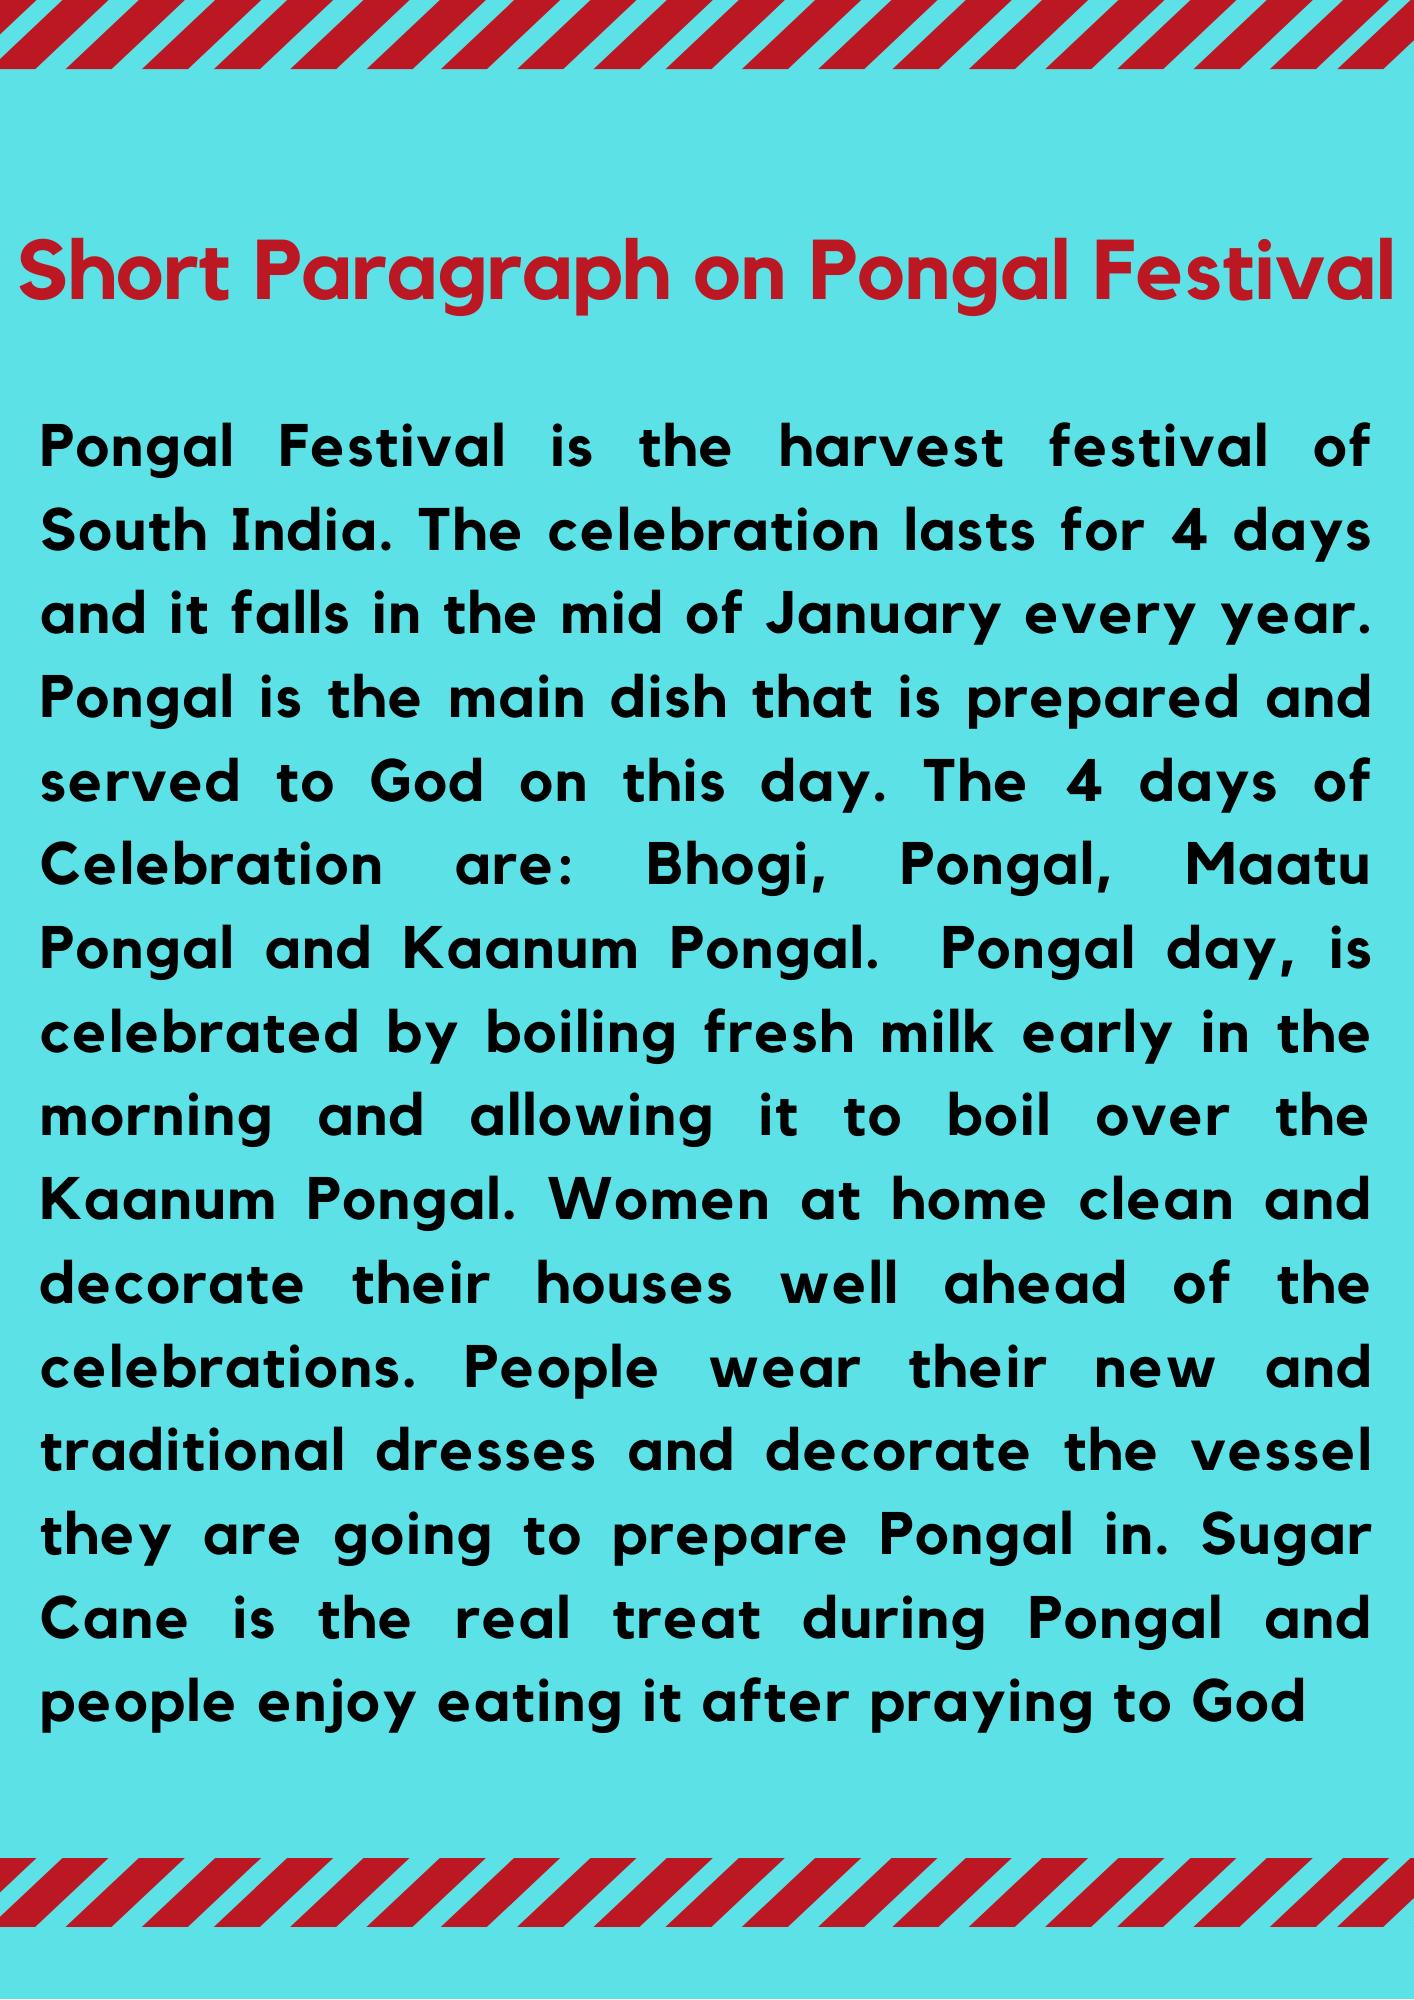 Short Paragraph on Pongal